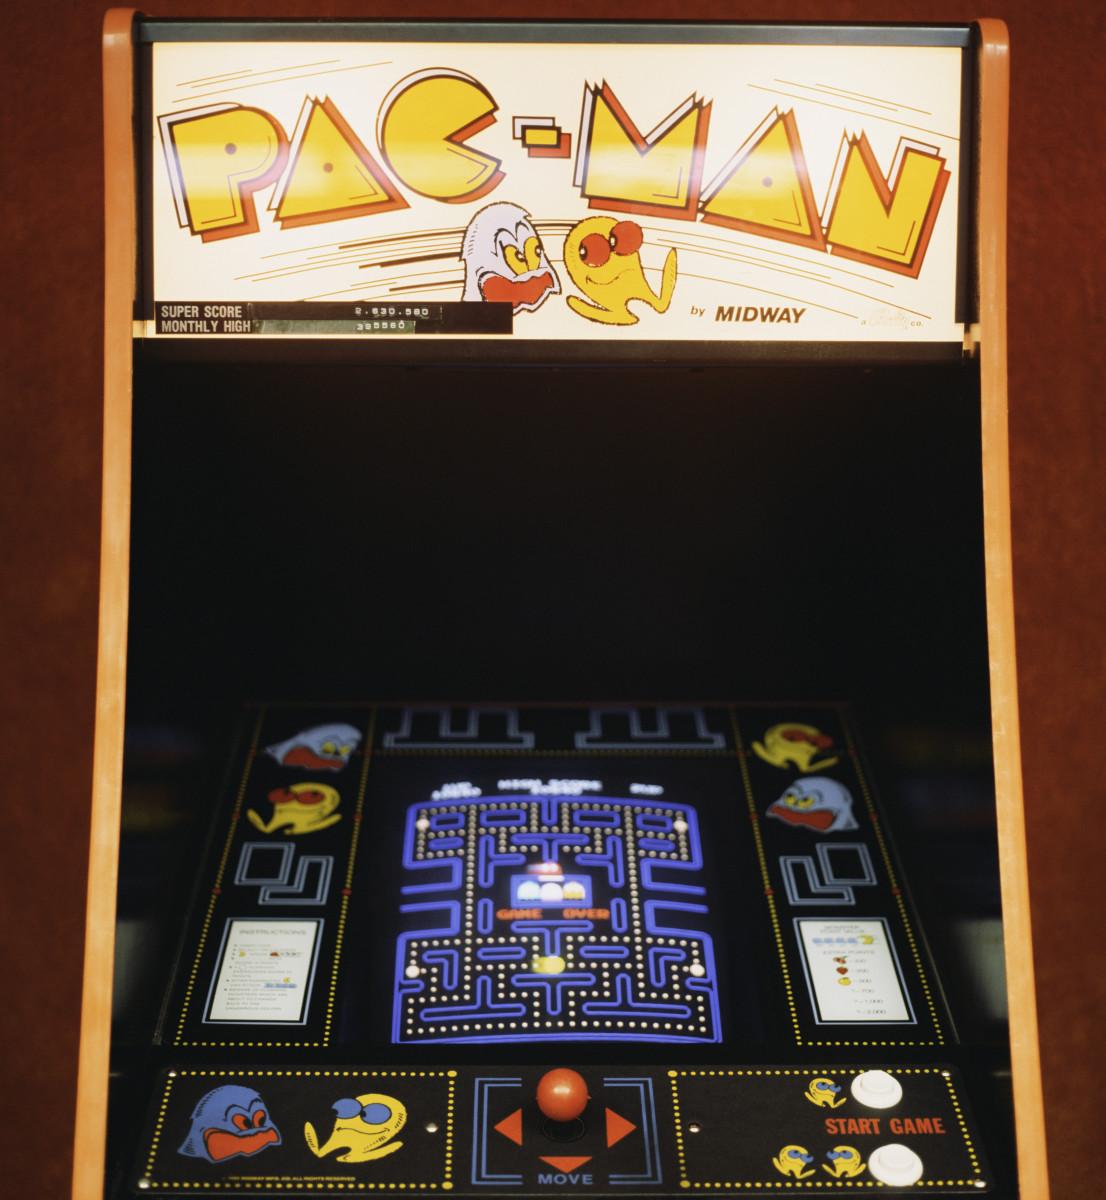 The Pac-Man arcade game.